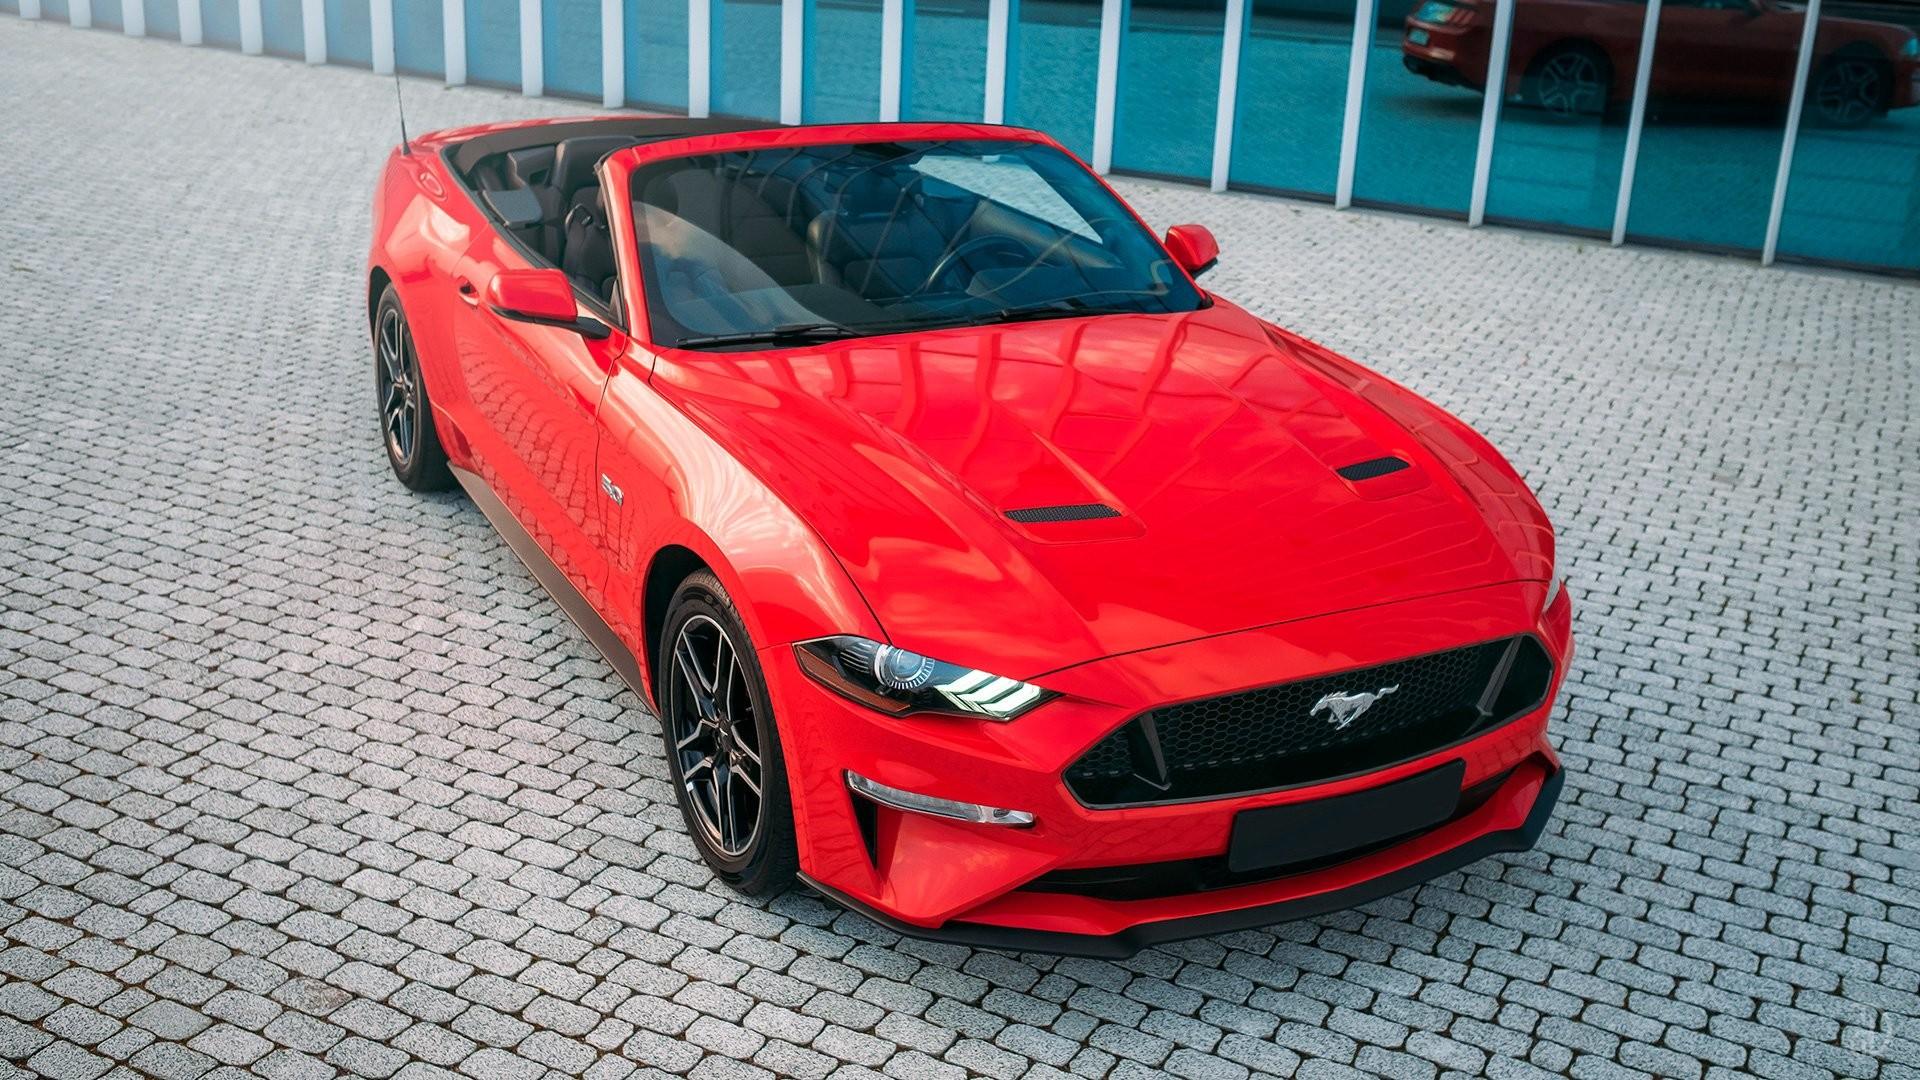 Аренда Ford Mustang GT 5.0  в Москве. Фото 3